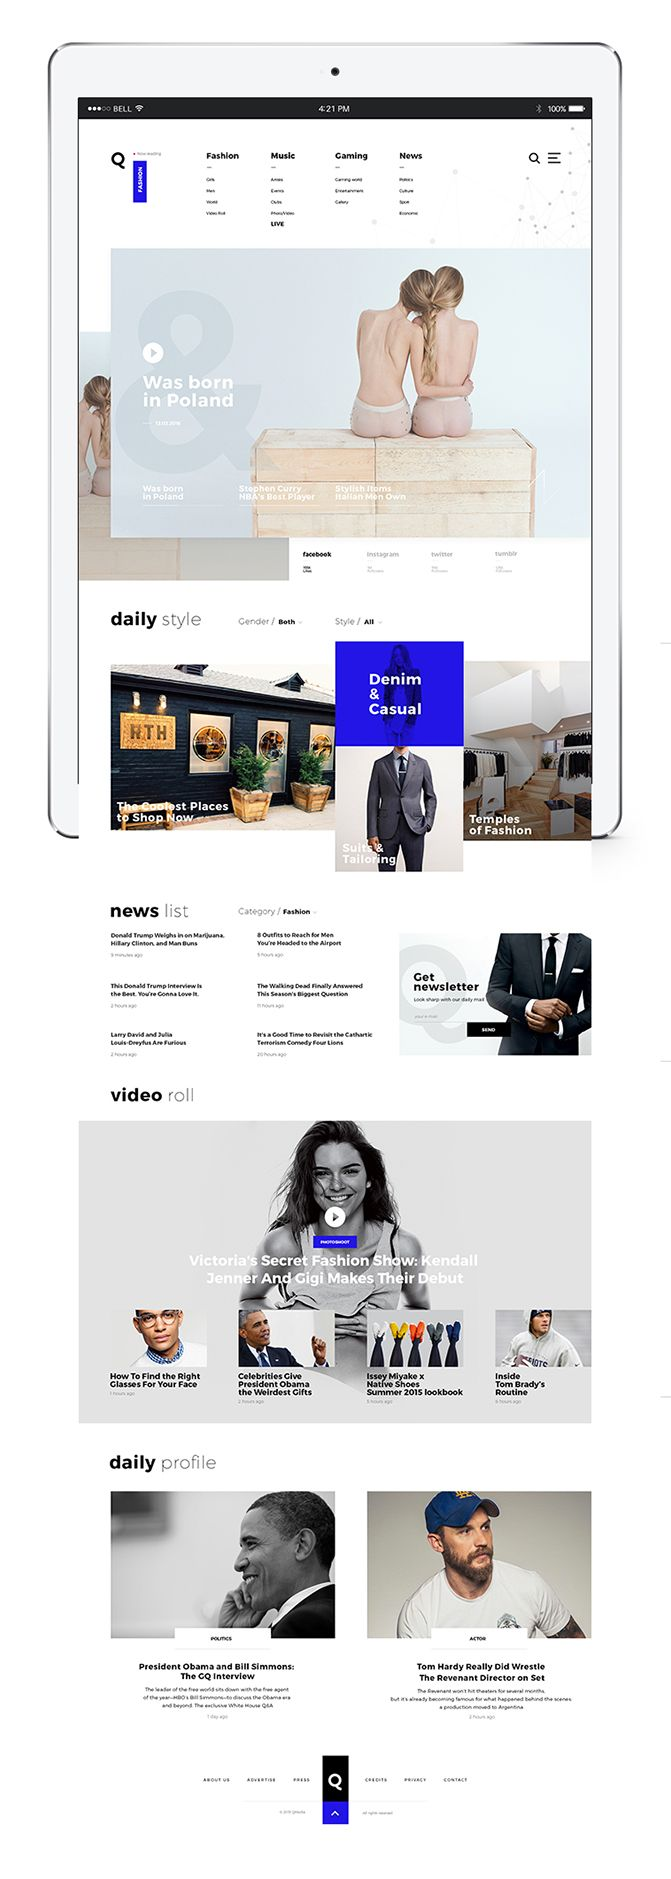 https://www.behance.net/gallery/31654751/Q-Media-Concept